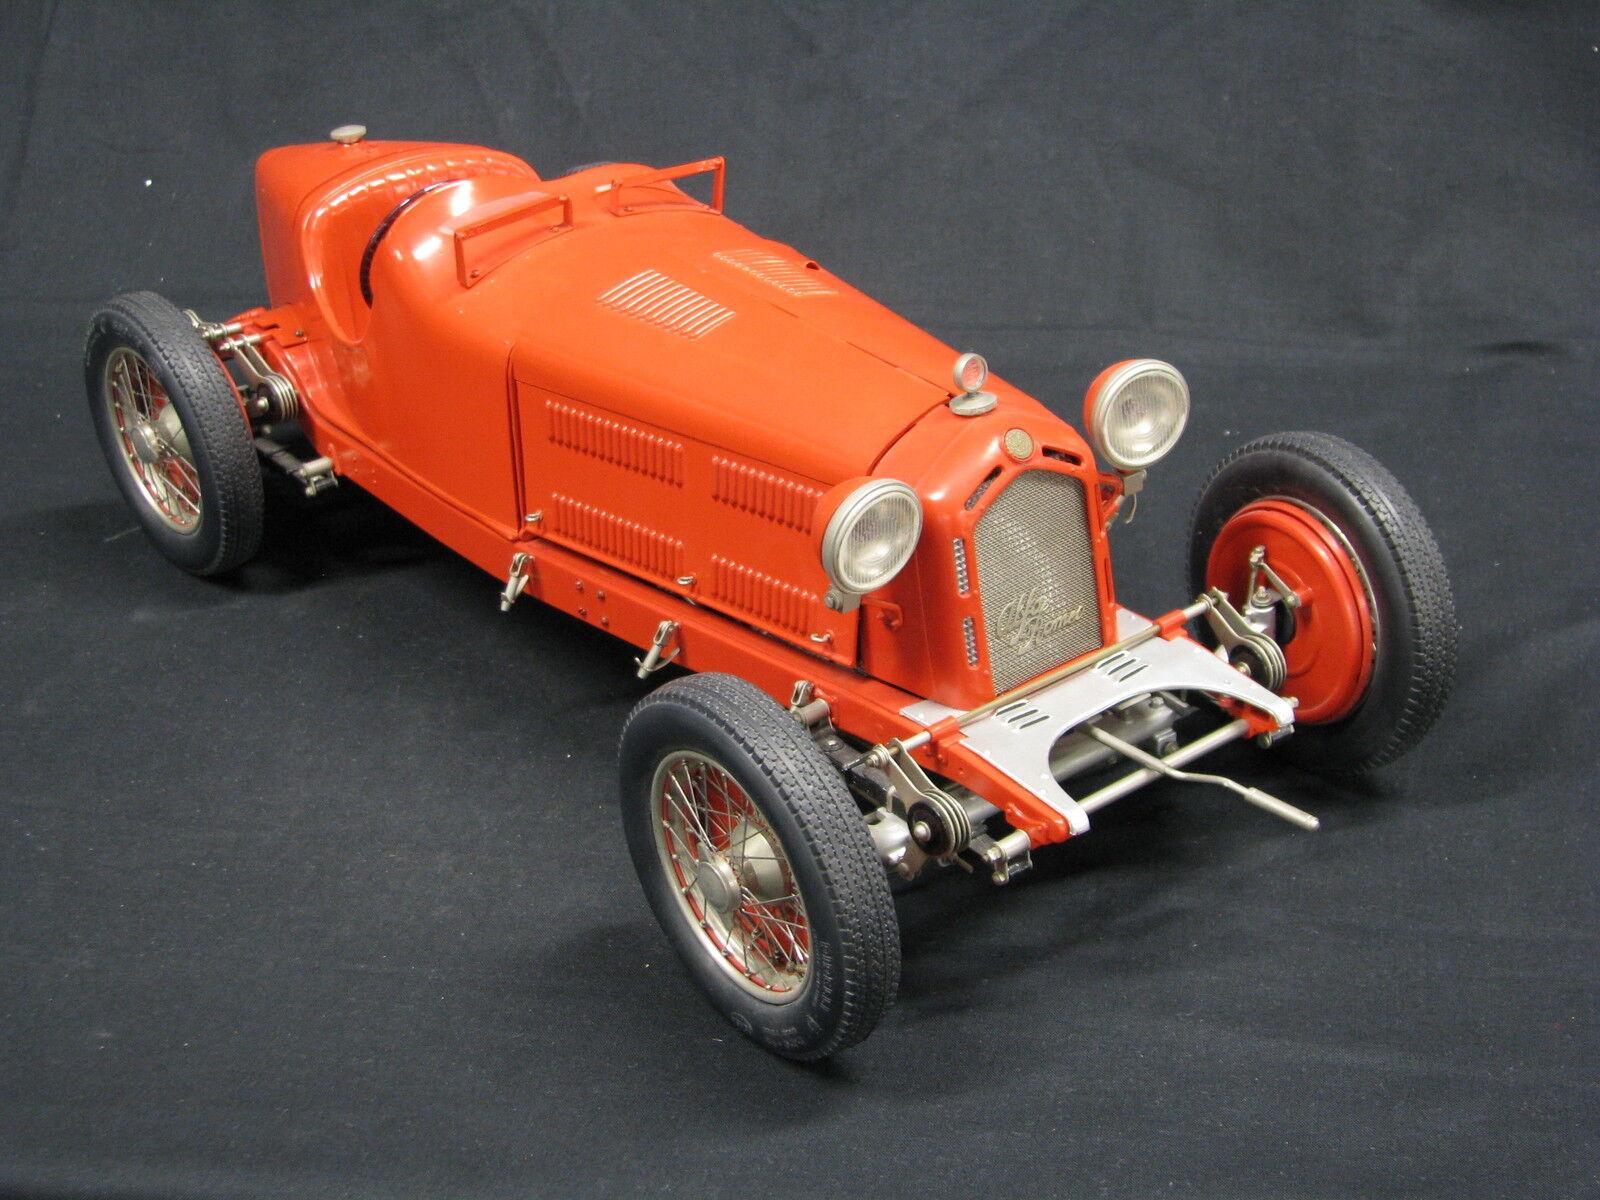 Pocher Alfa Romeo 8C 2300 Monza 1931 1:8 Red (Built Kit)